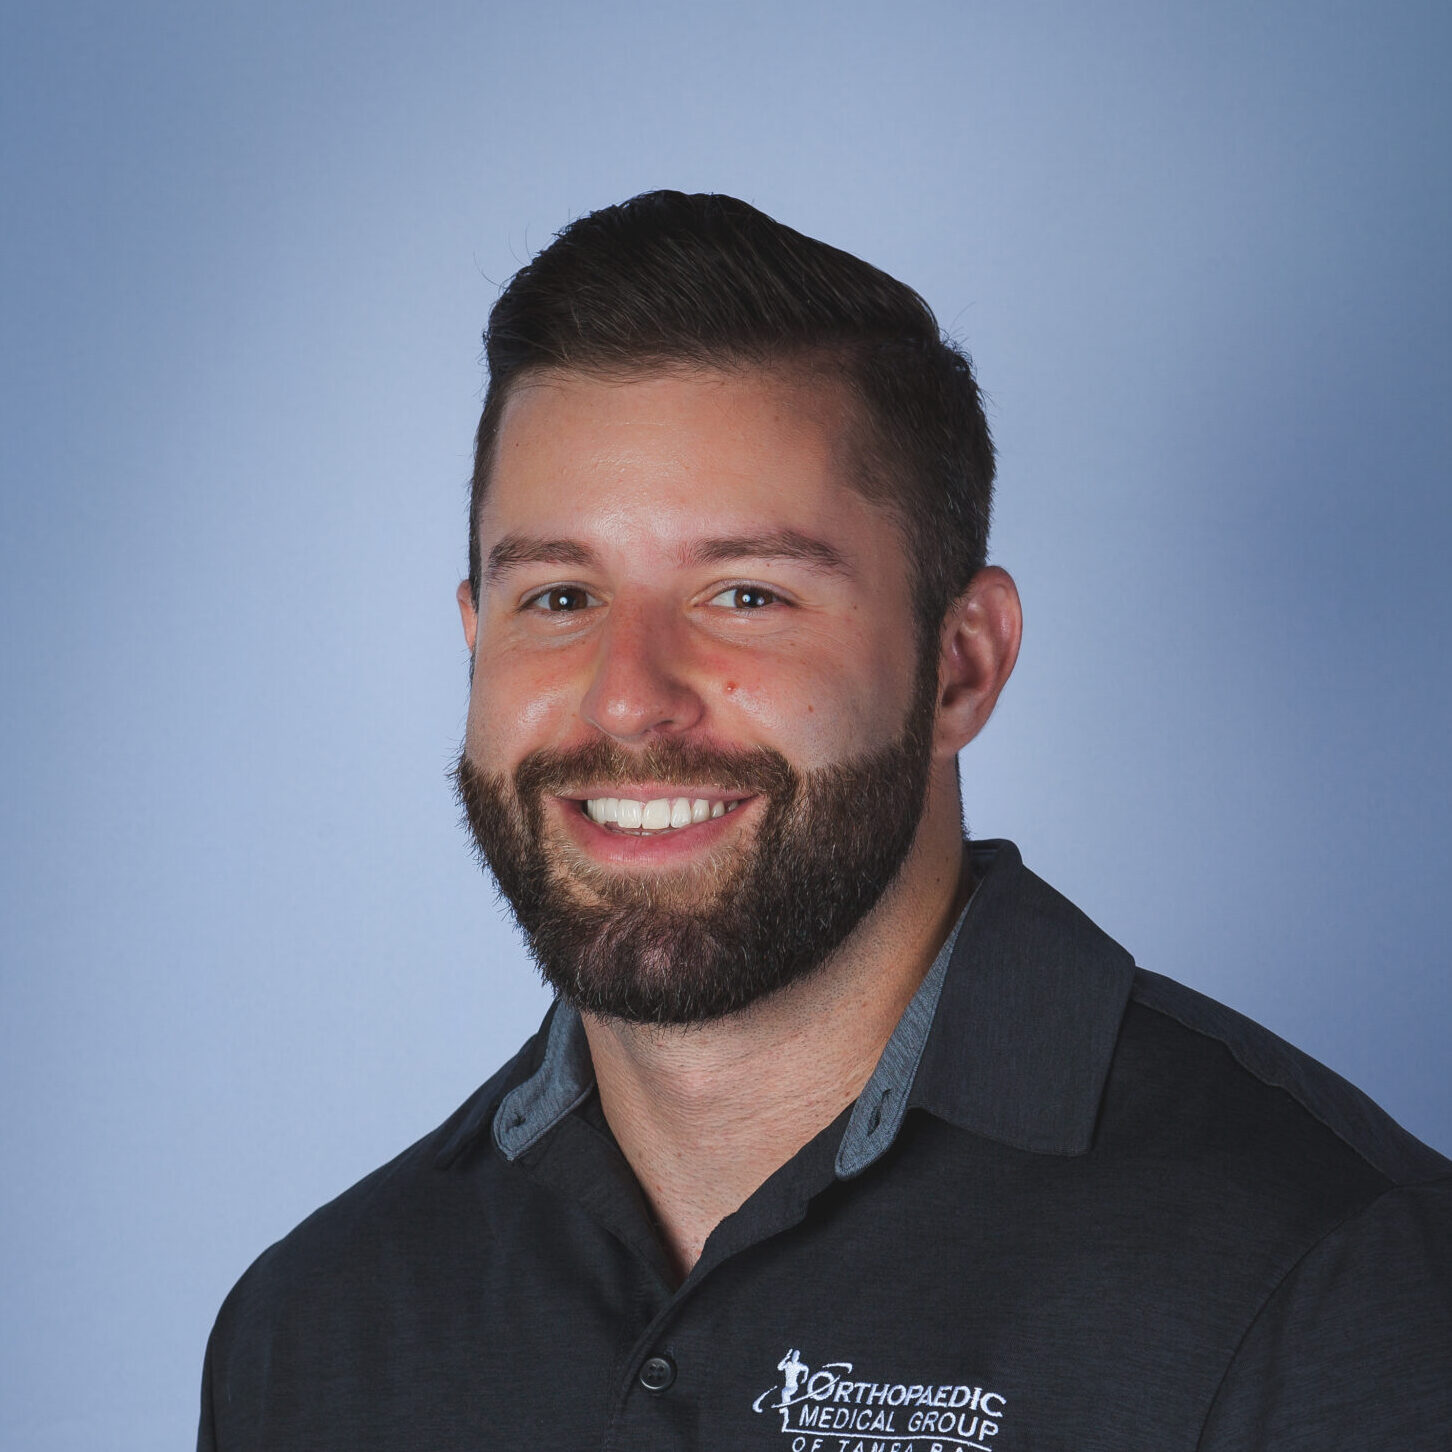 Spencer Beaudreault - Marketing Specialist at OMGTB